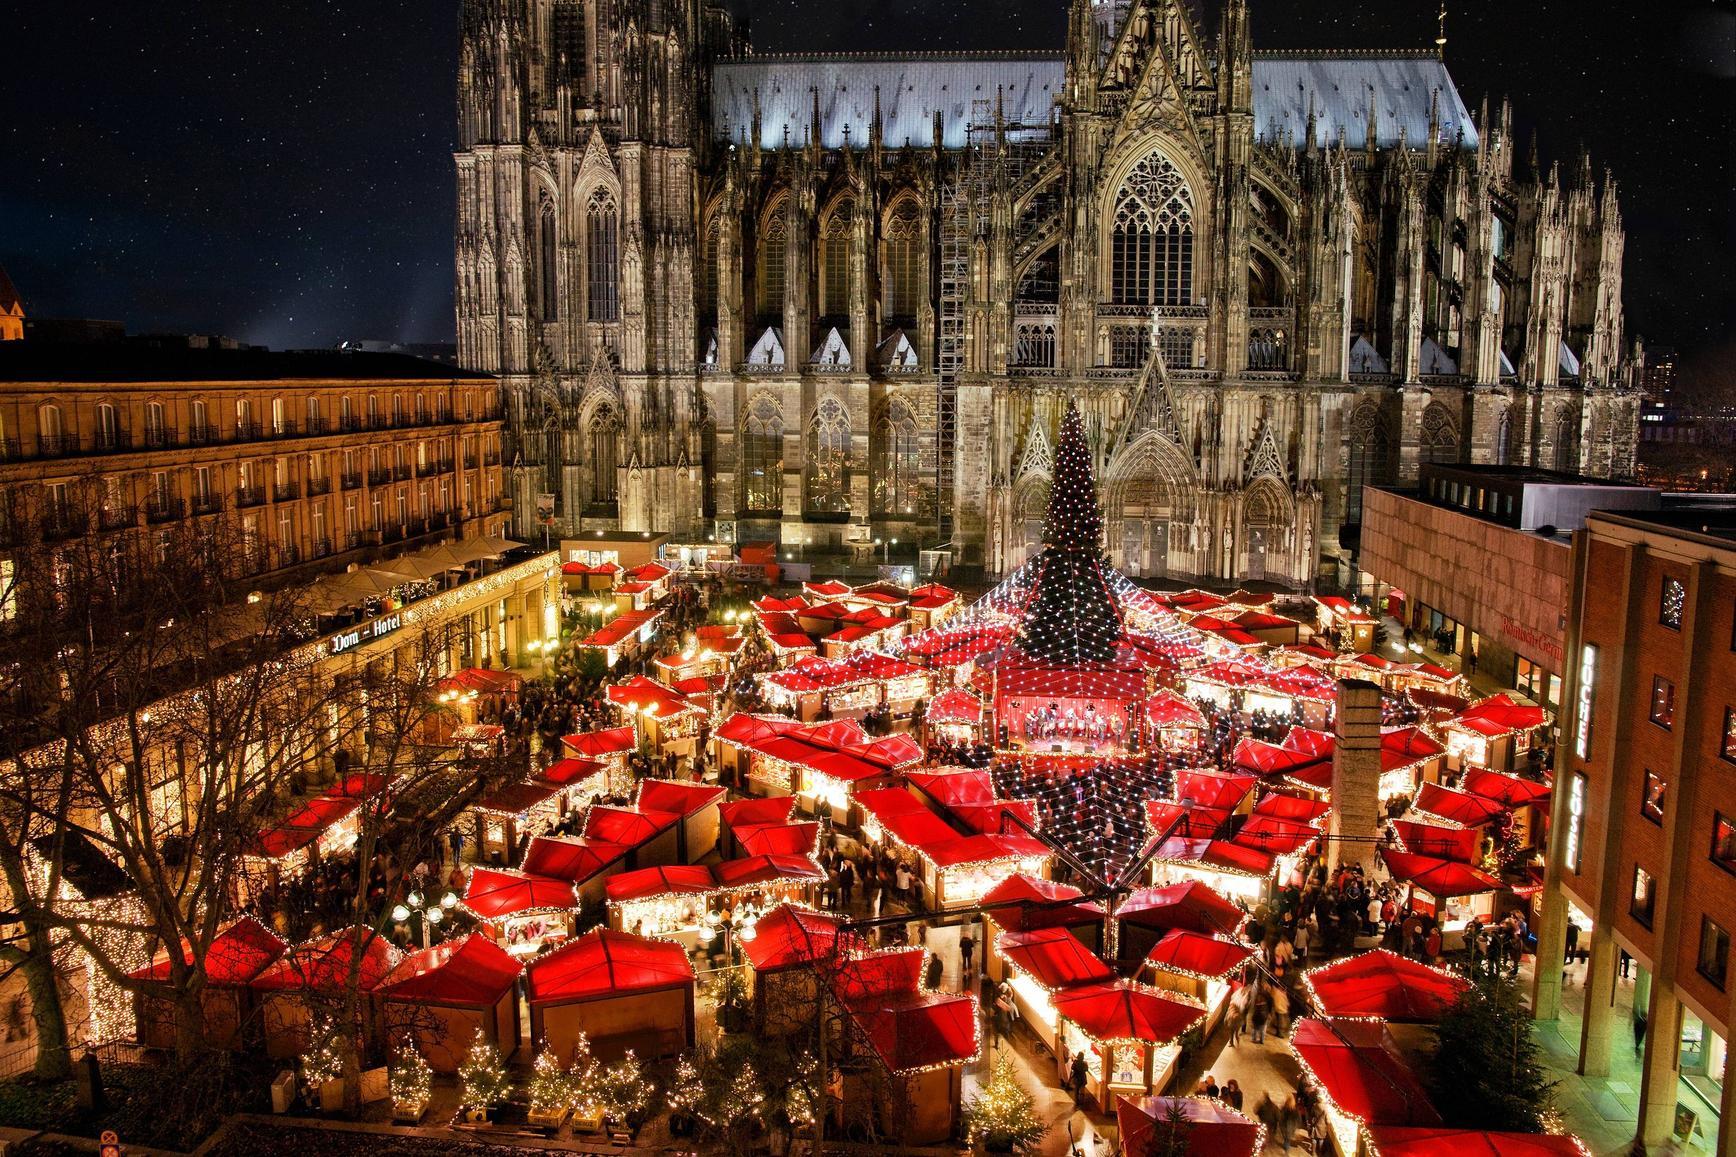 Christmas_market_Cologne_Germany_Imgur